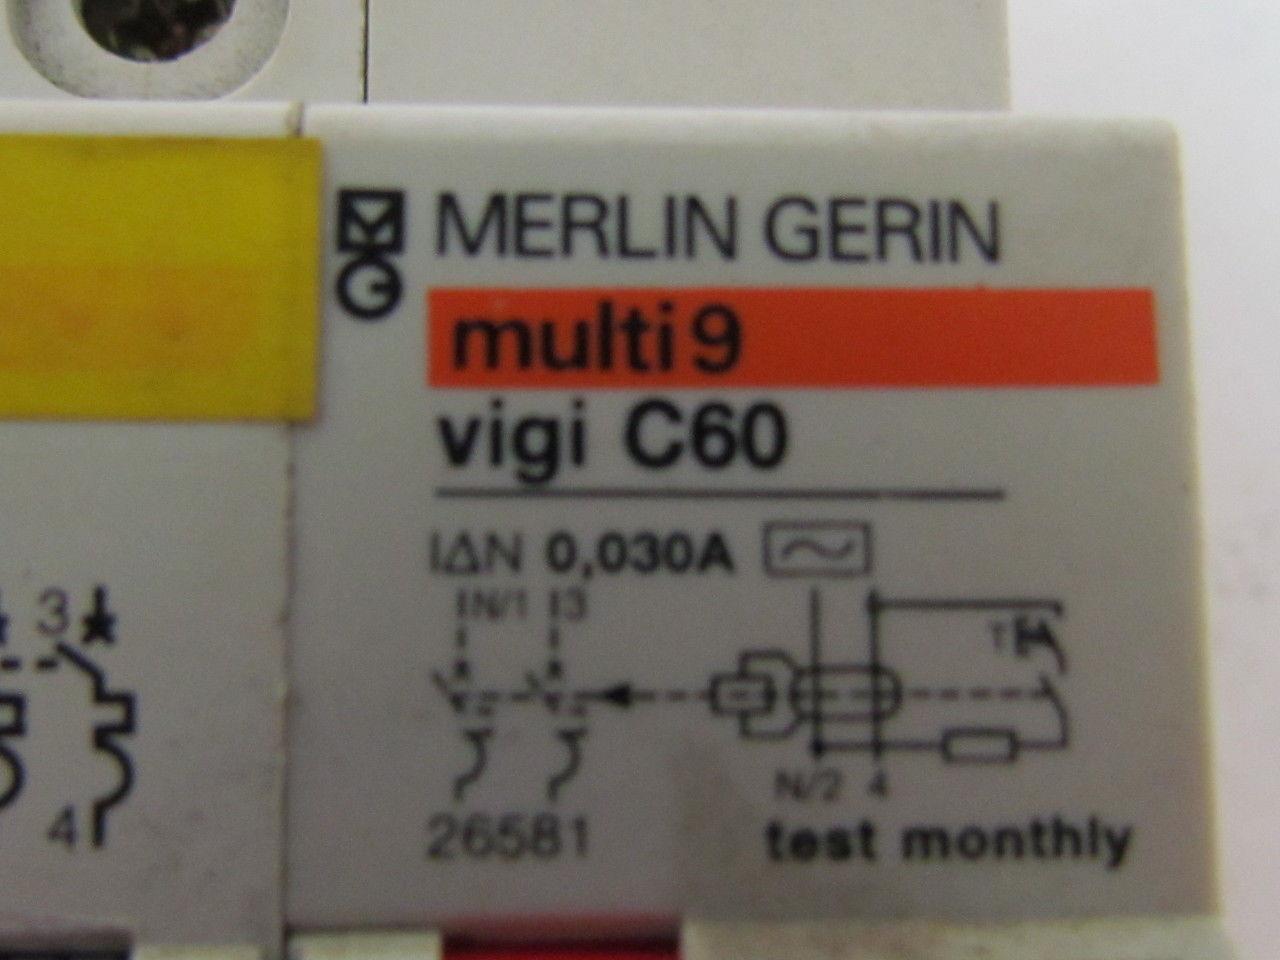 Merlin gerin multi 9 c60n 24263 2 pole circuit breaker c1 - Merlin gerin multi 9 ...